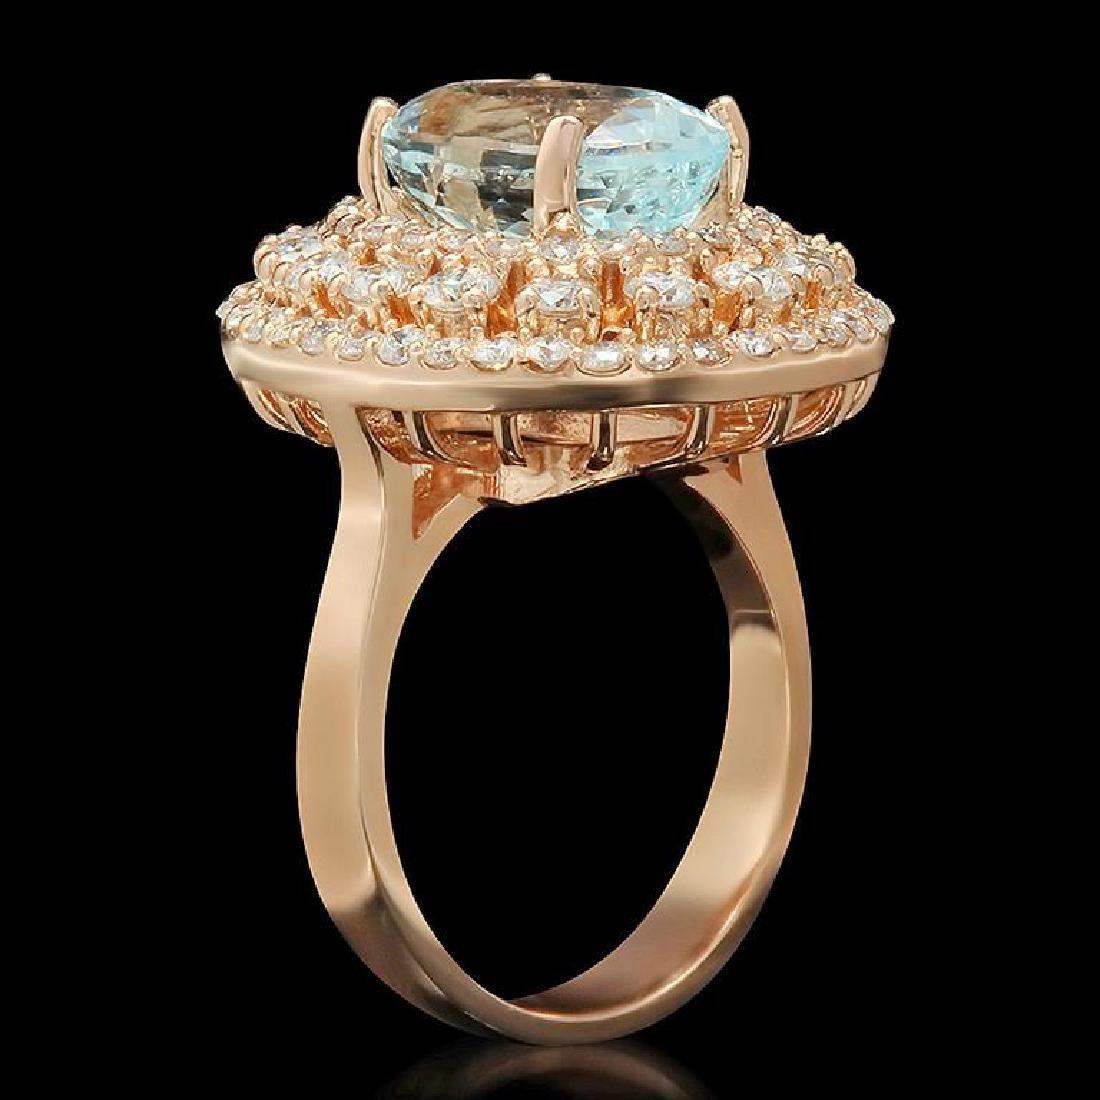 14K Gold 4.35ct Aquamarine 2.09ct Diamond Ring - 2